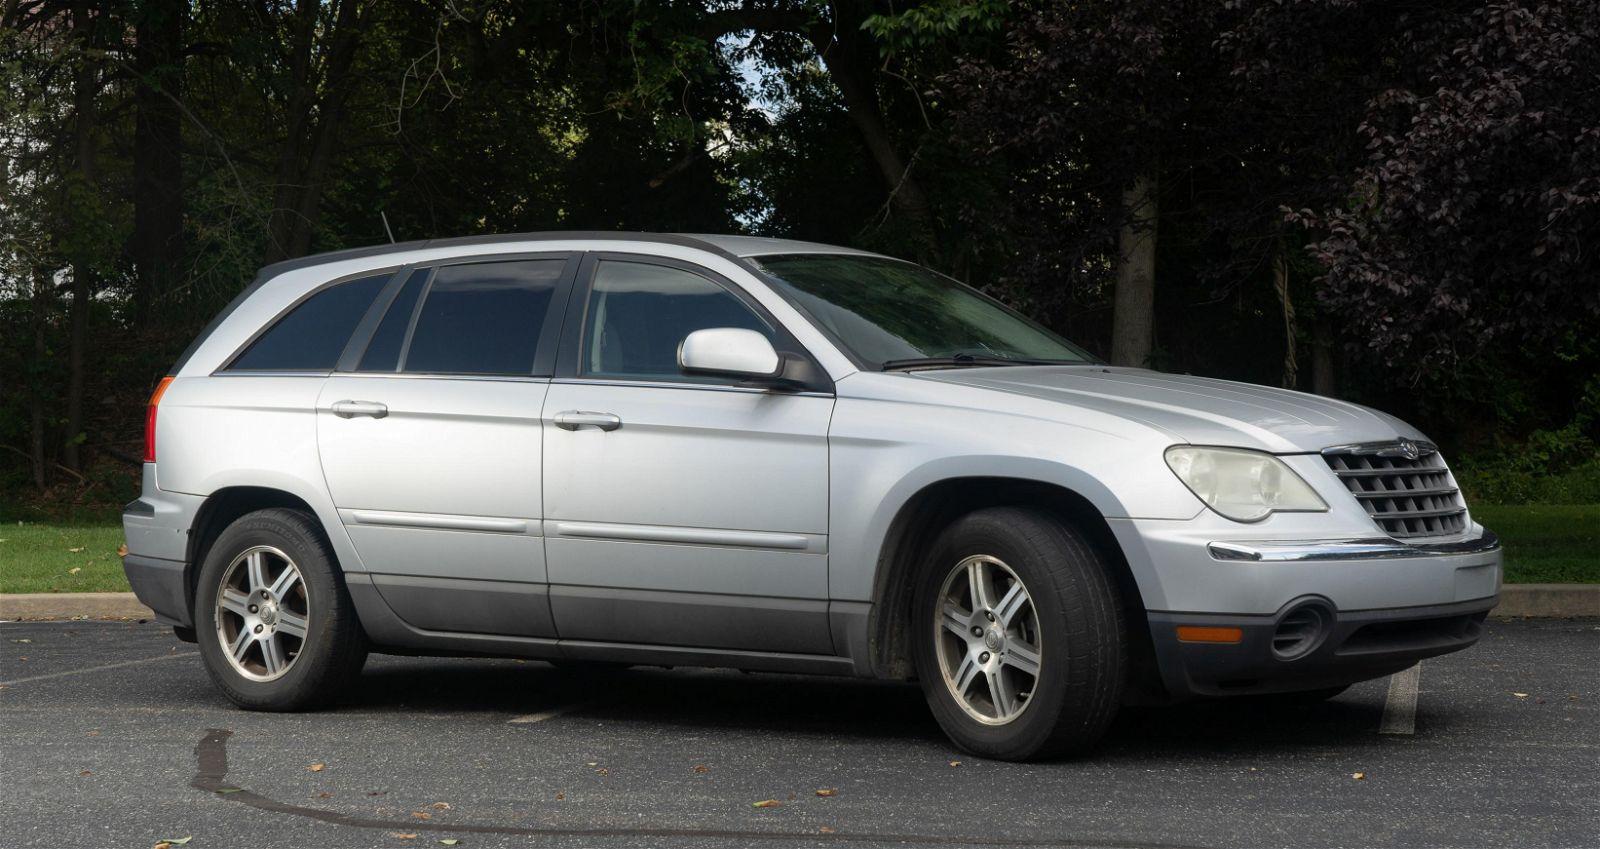 2007 Chrysler Pacifica Touring Wagon/SUV